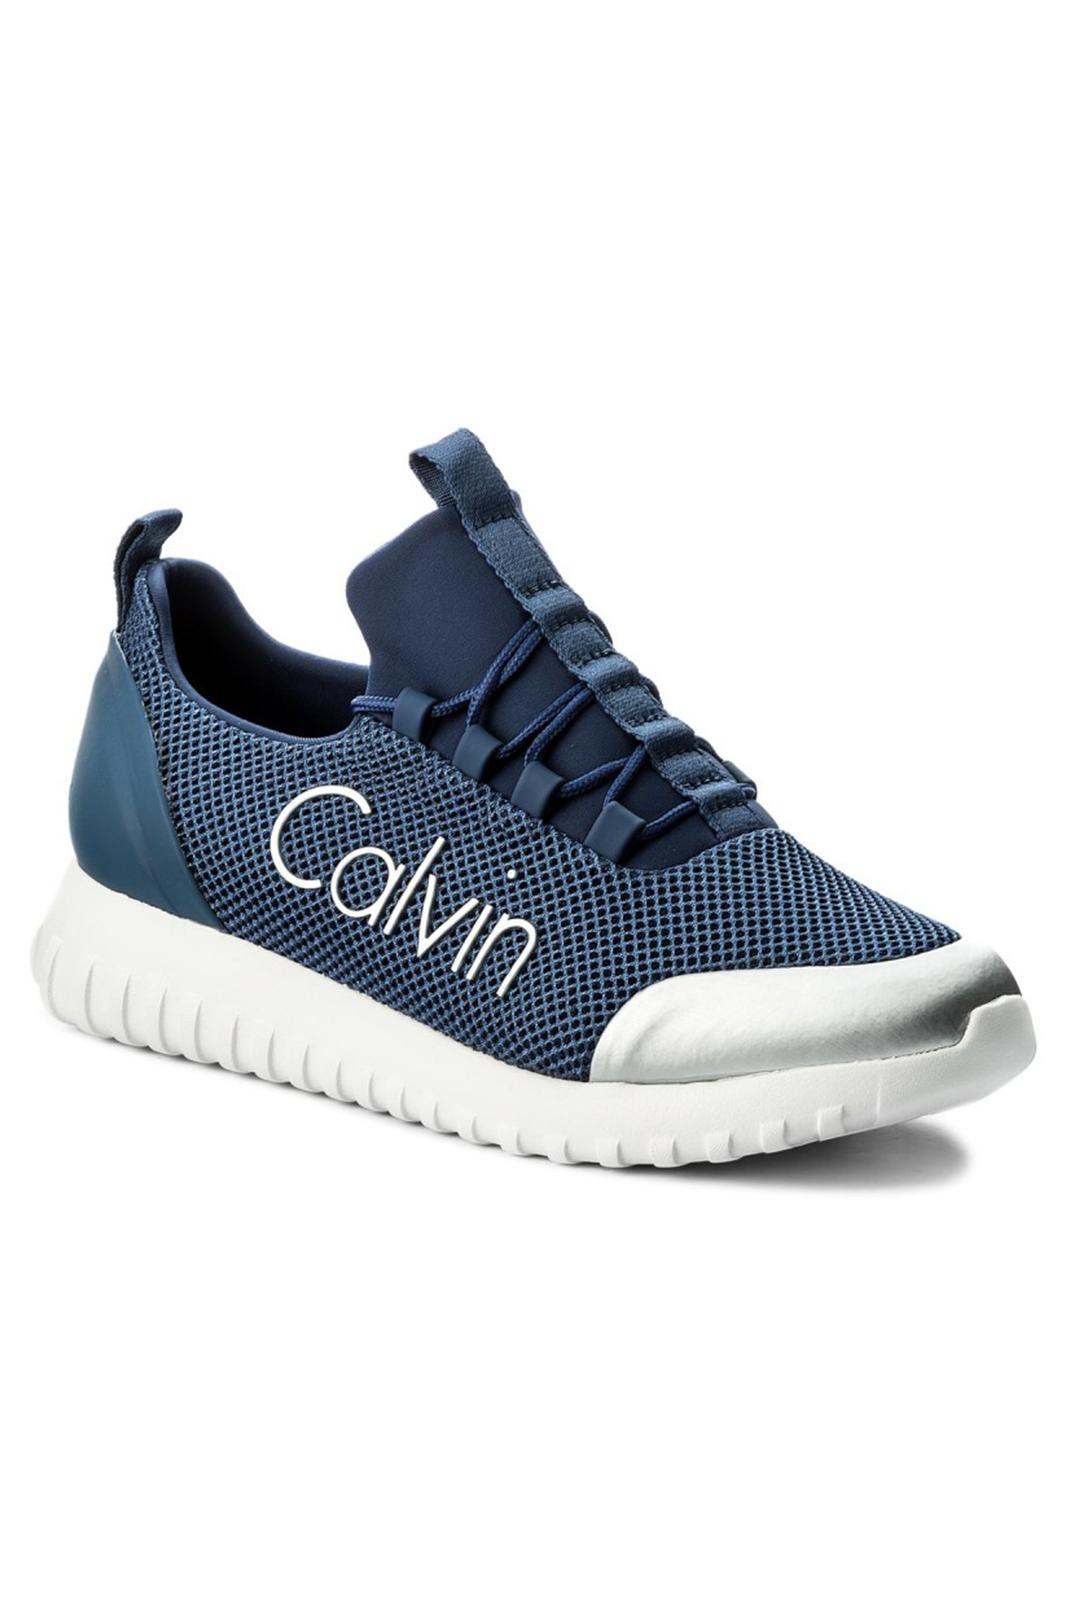 Calvin Klein Jeans Chaussures Ron Steel Blue Silver Calvin Klein Jeans soldes 446GqRr